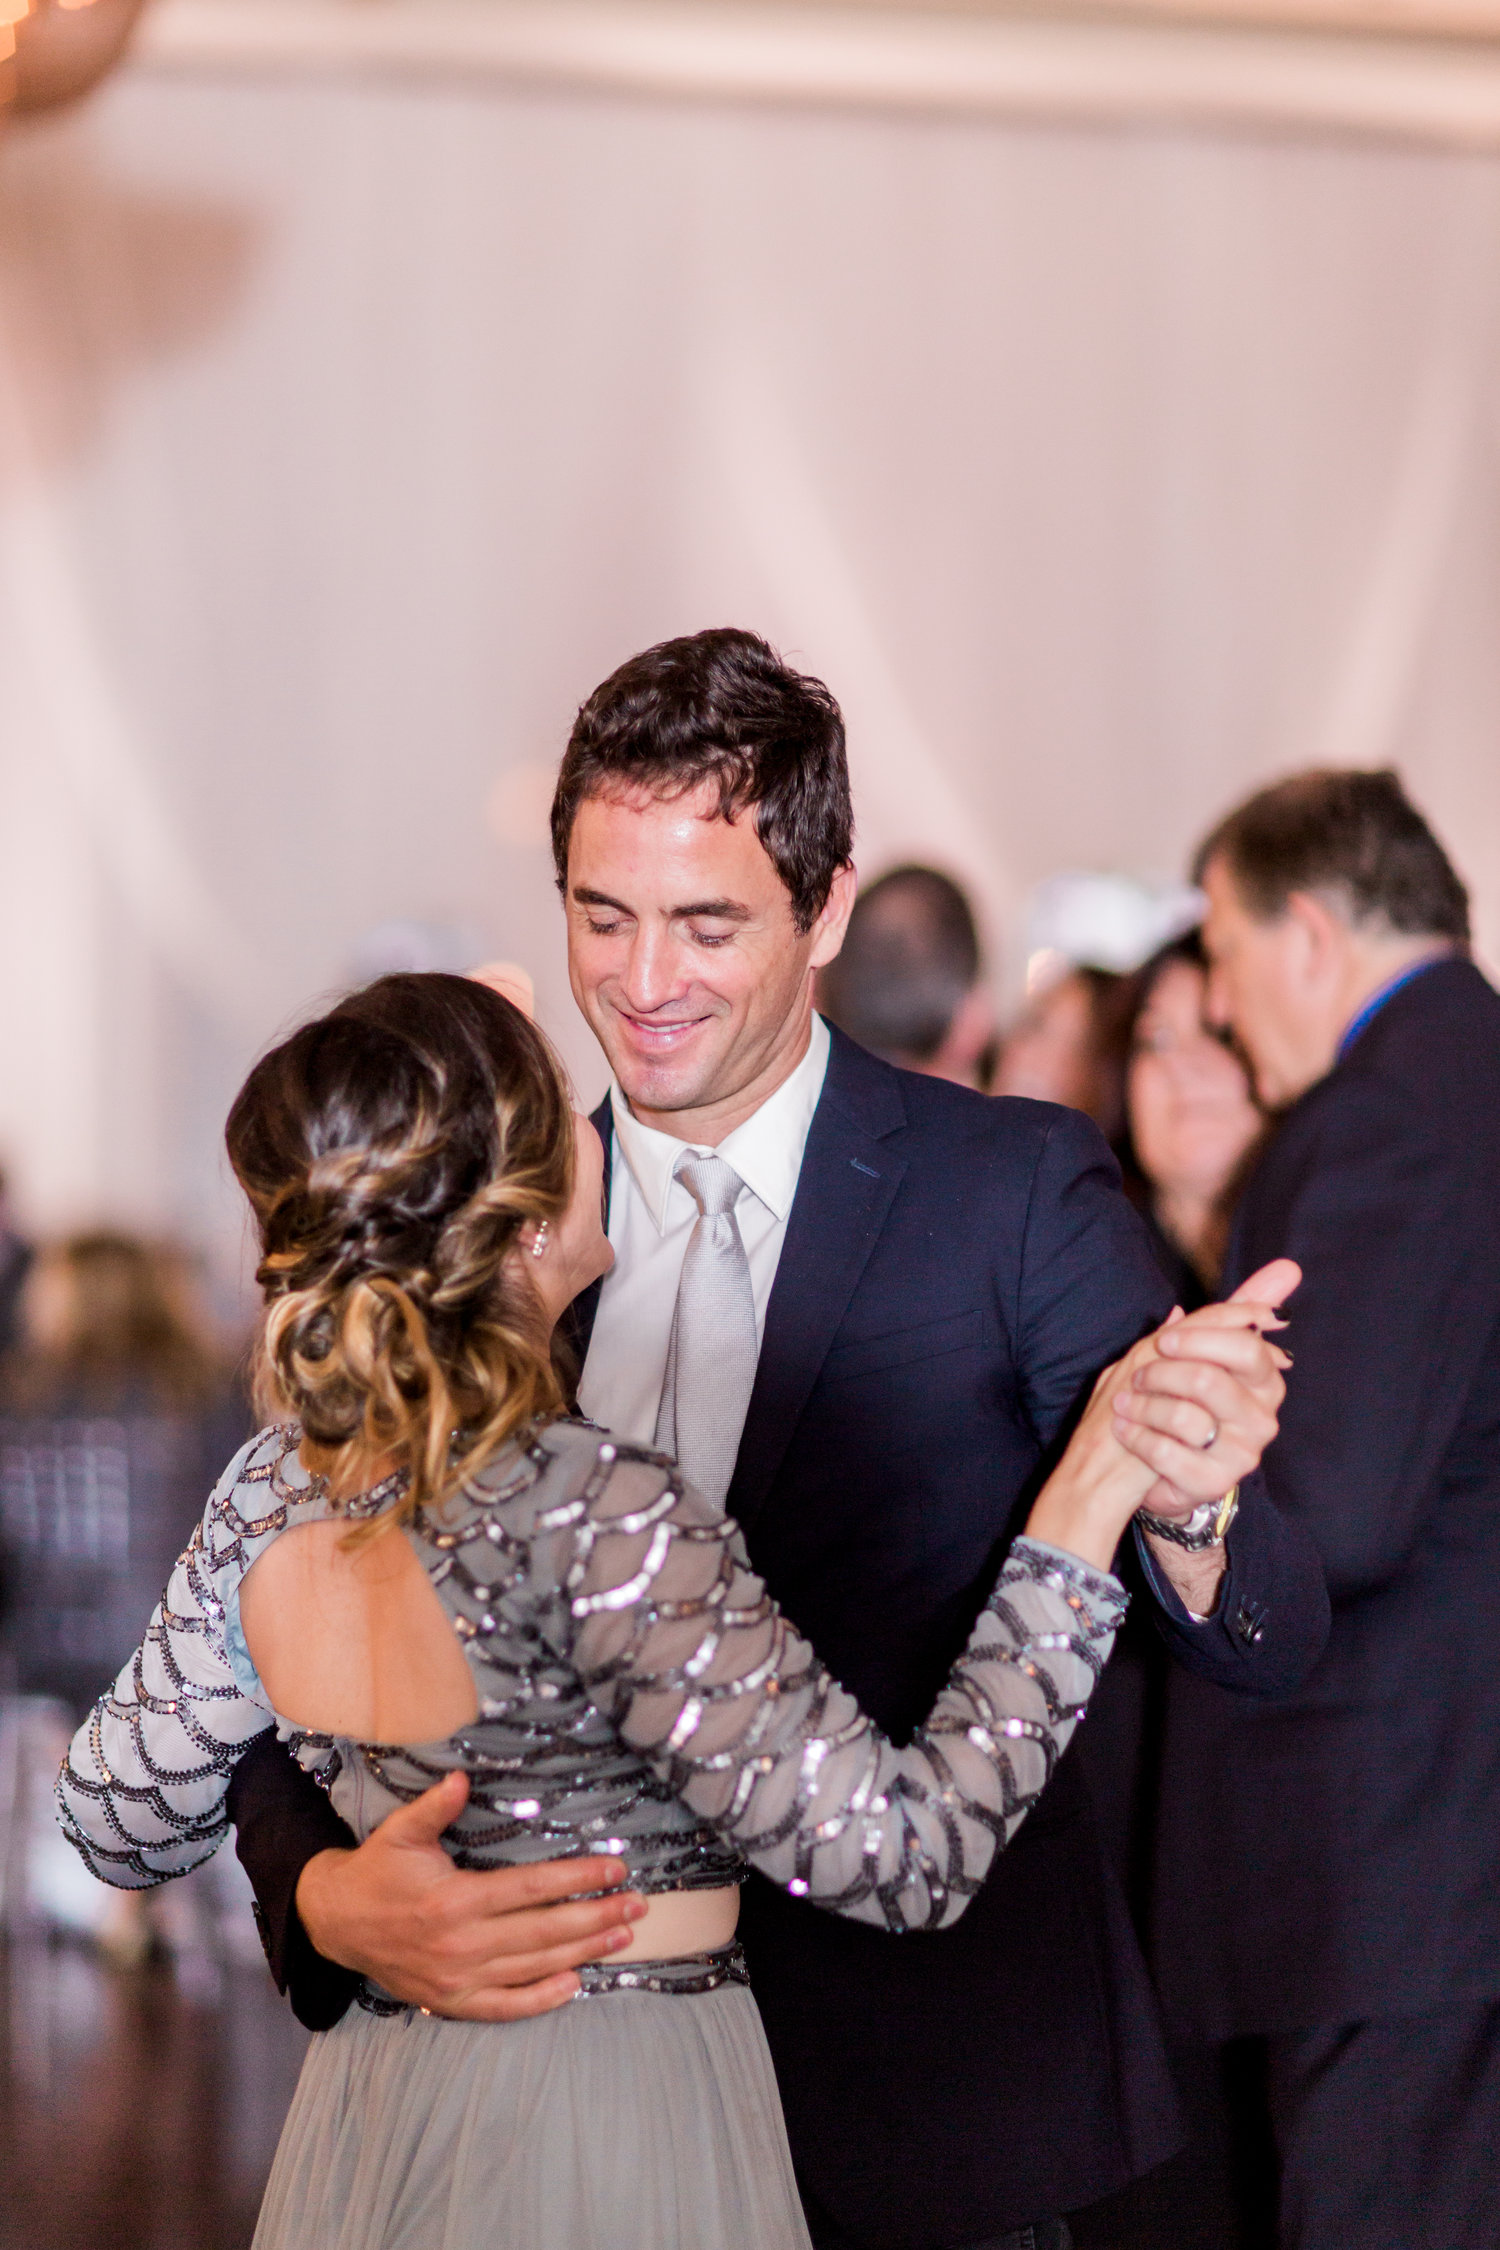 Danielle-Giroux-Amir-Golbazi-Toronto-Wedding-Photographer-Bellvue-Manor_DeLuca_2-833.jpg